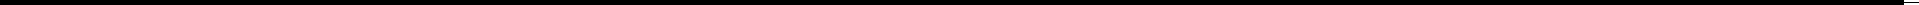 black faded line